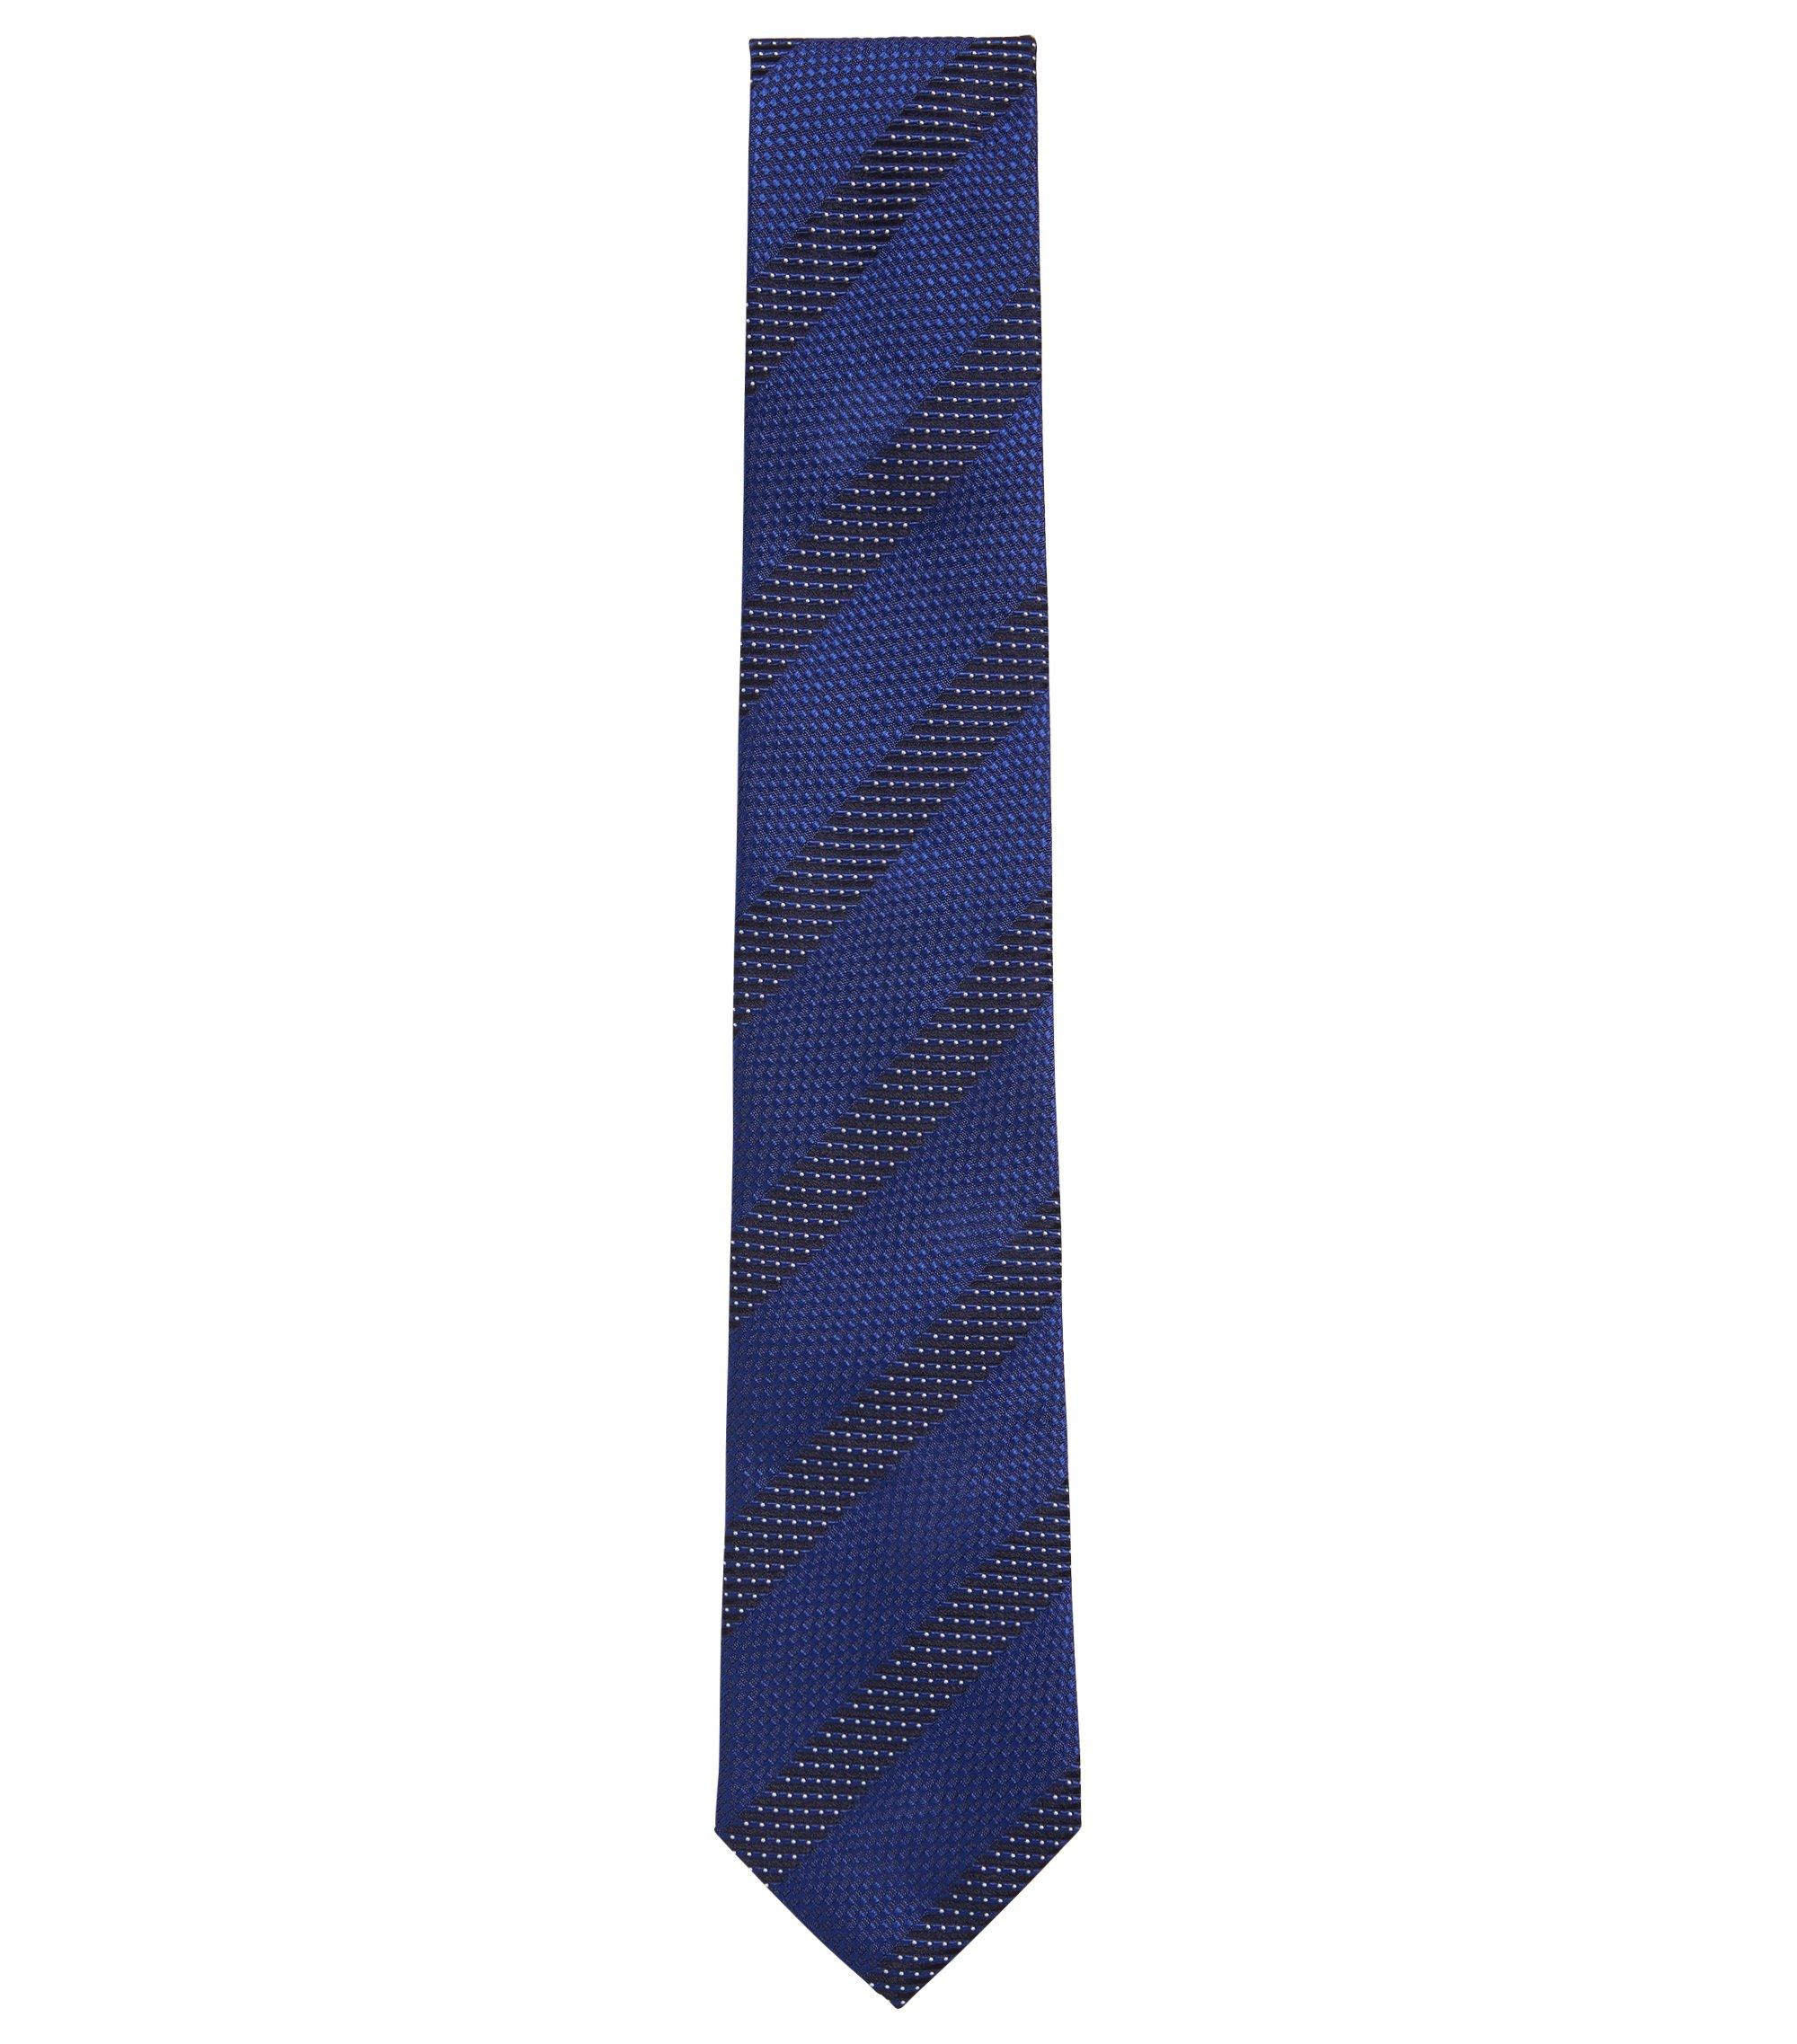 Patterened Italian Silk Tie, Blue